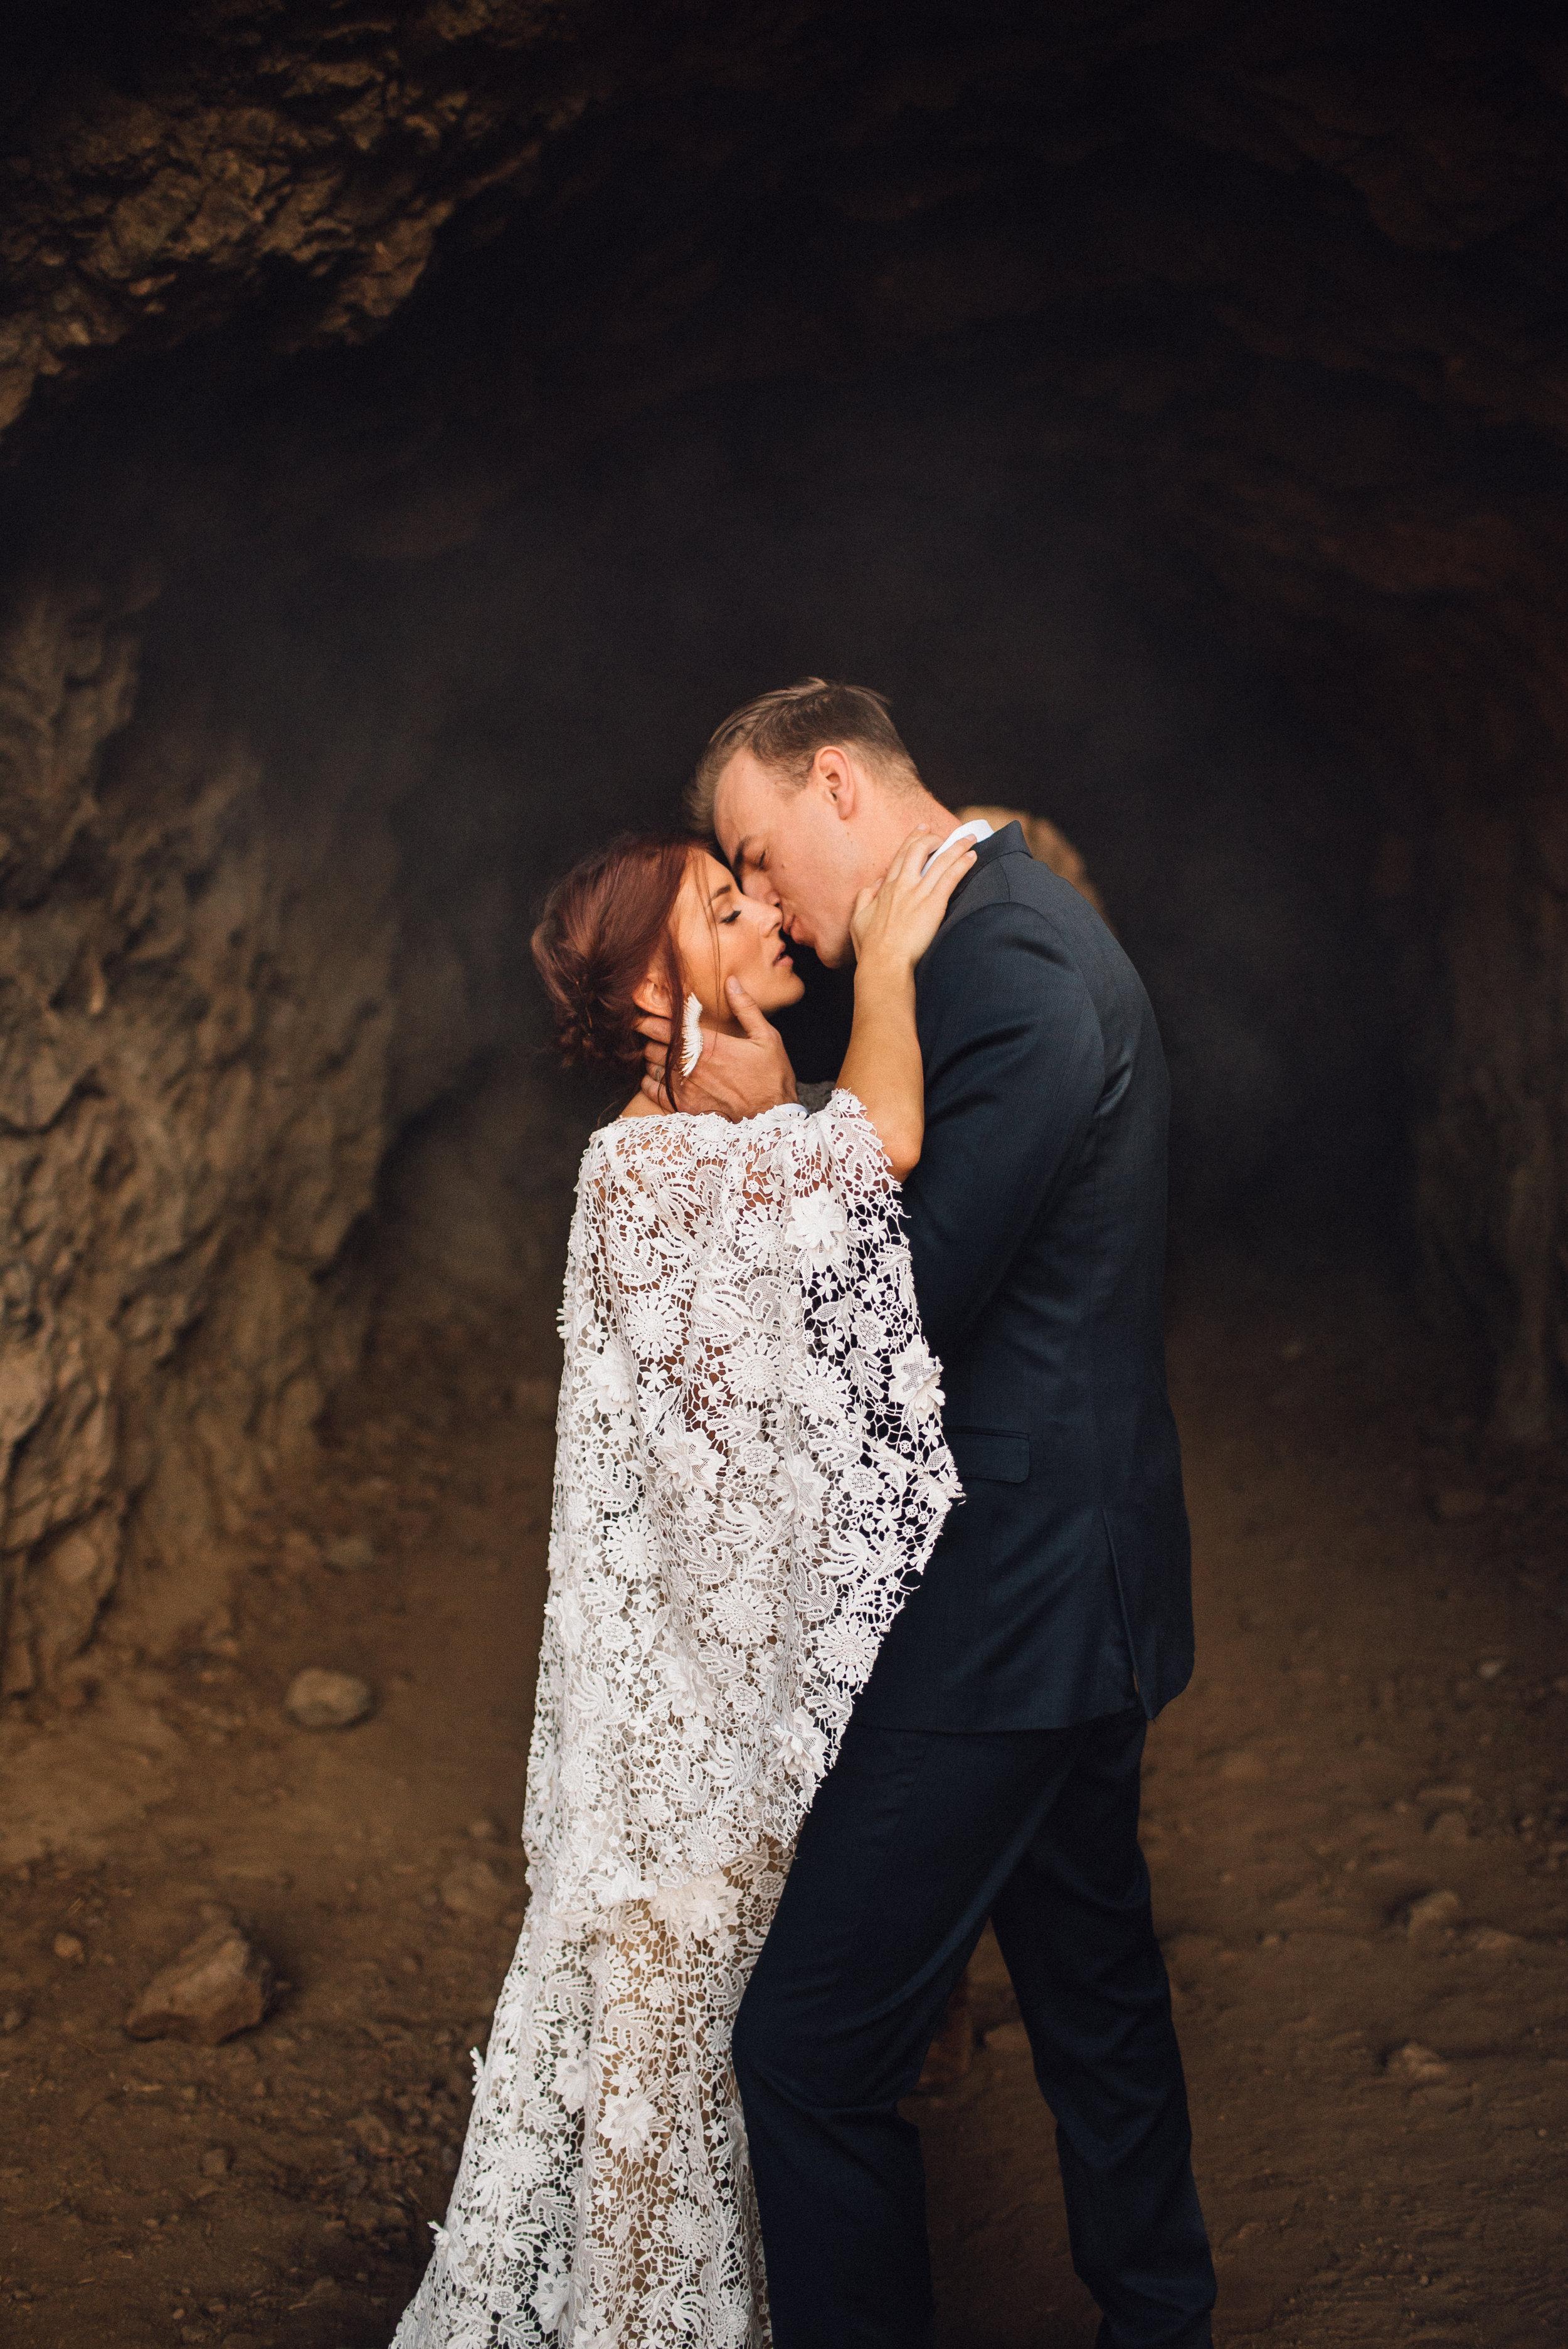 Aaron & Toni // Bronson Caves Elopement